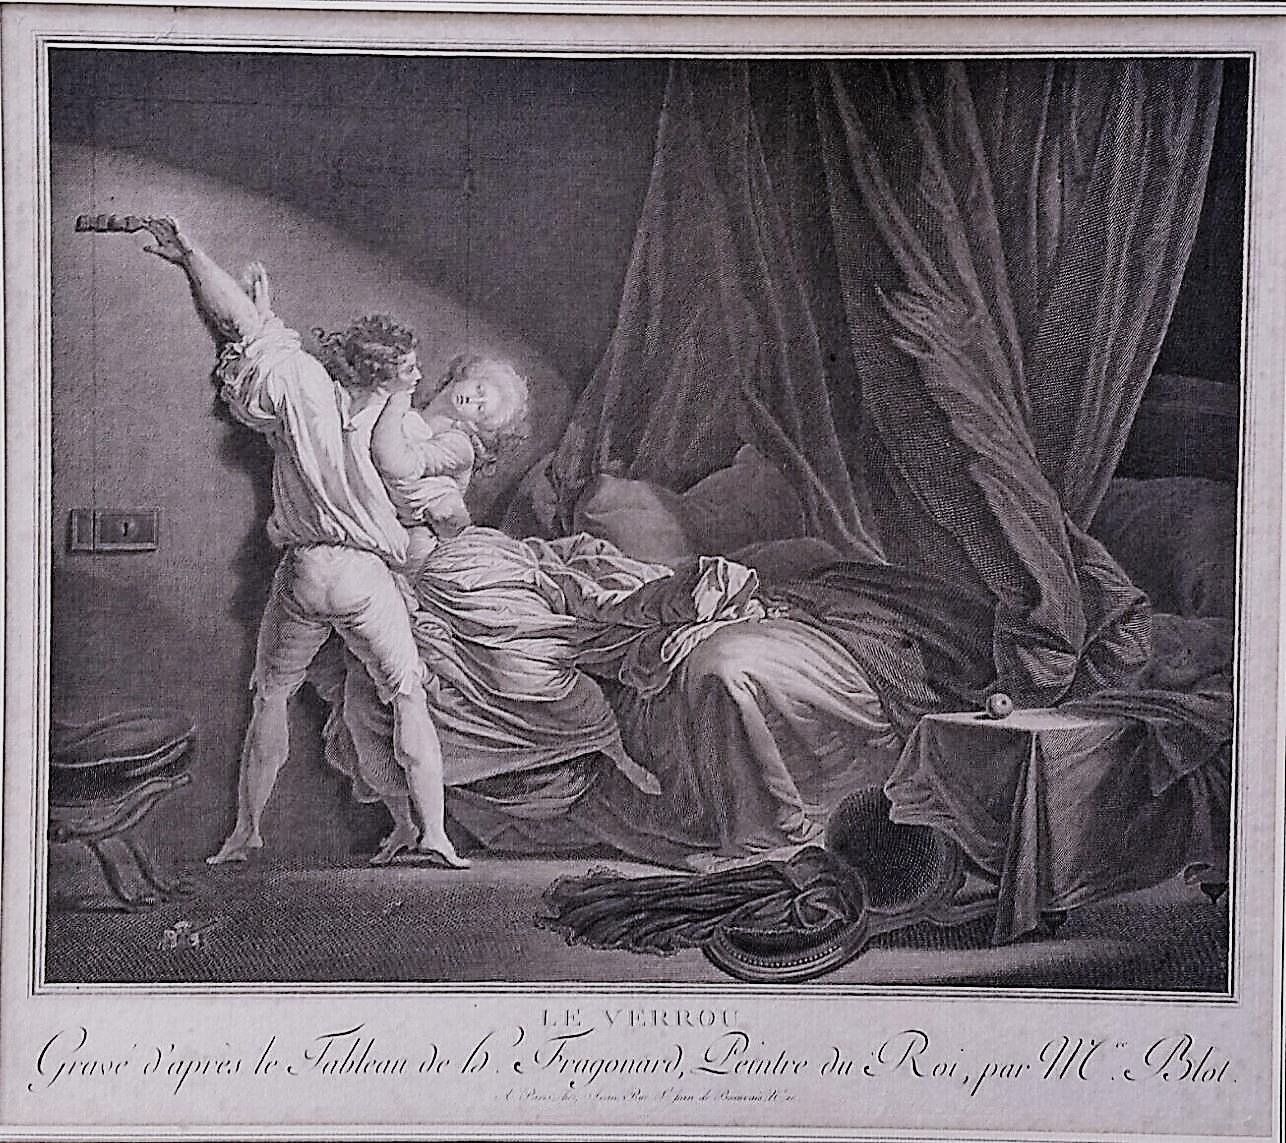 Fragonard 1784 Le Verrou Gravure de Blot